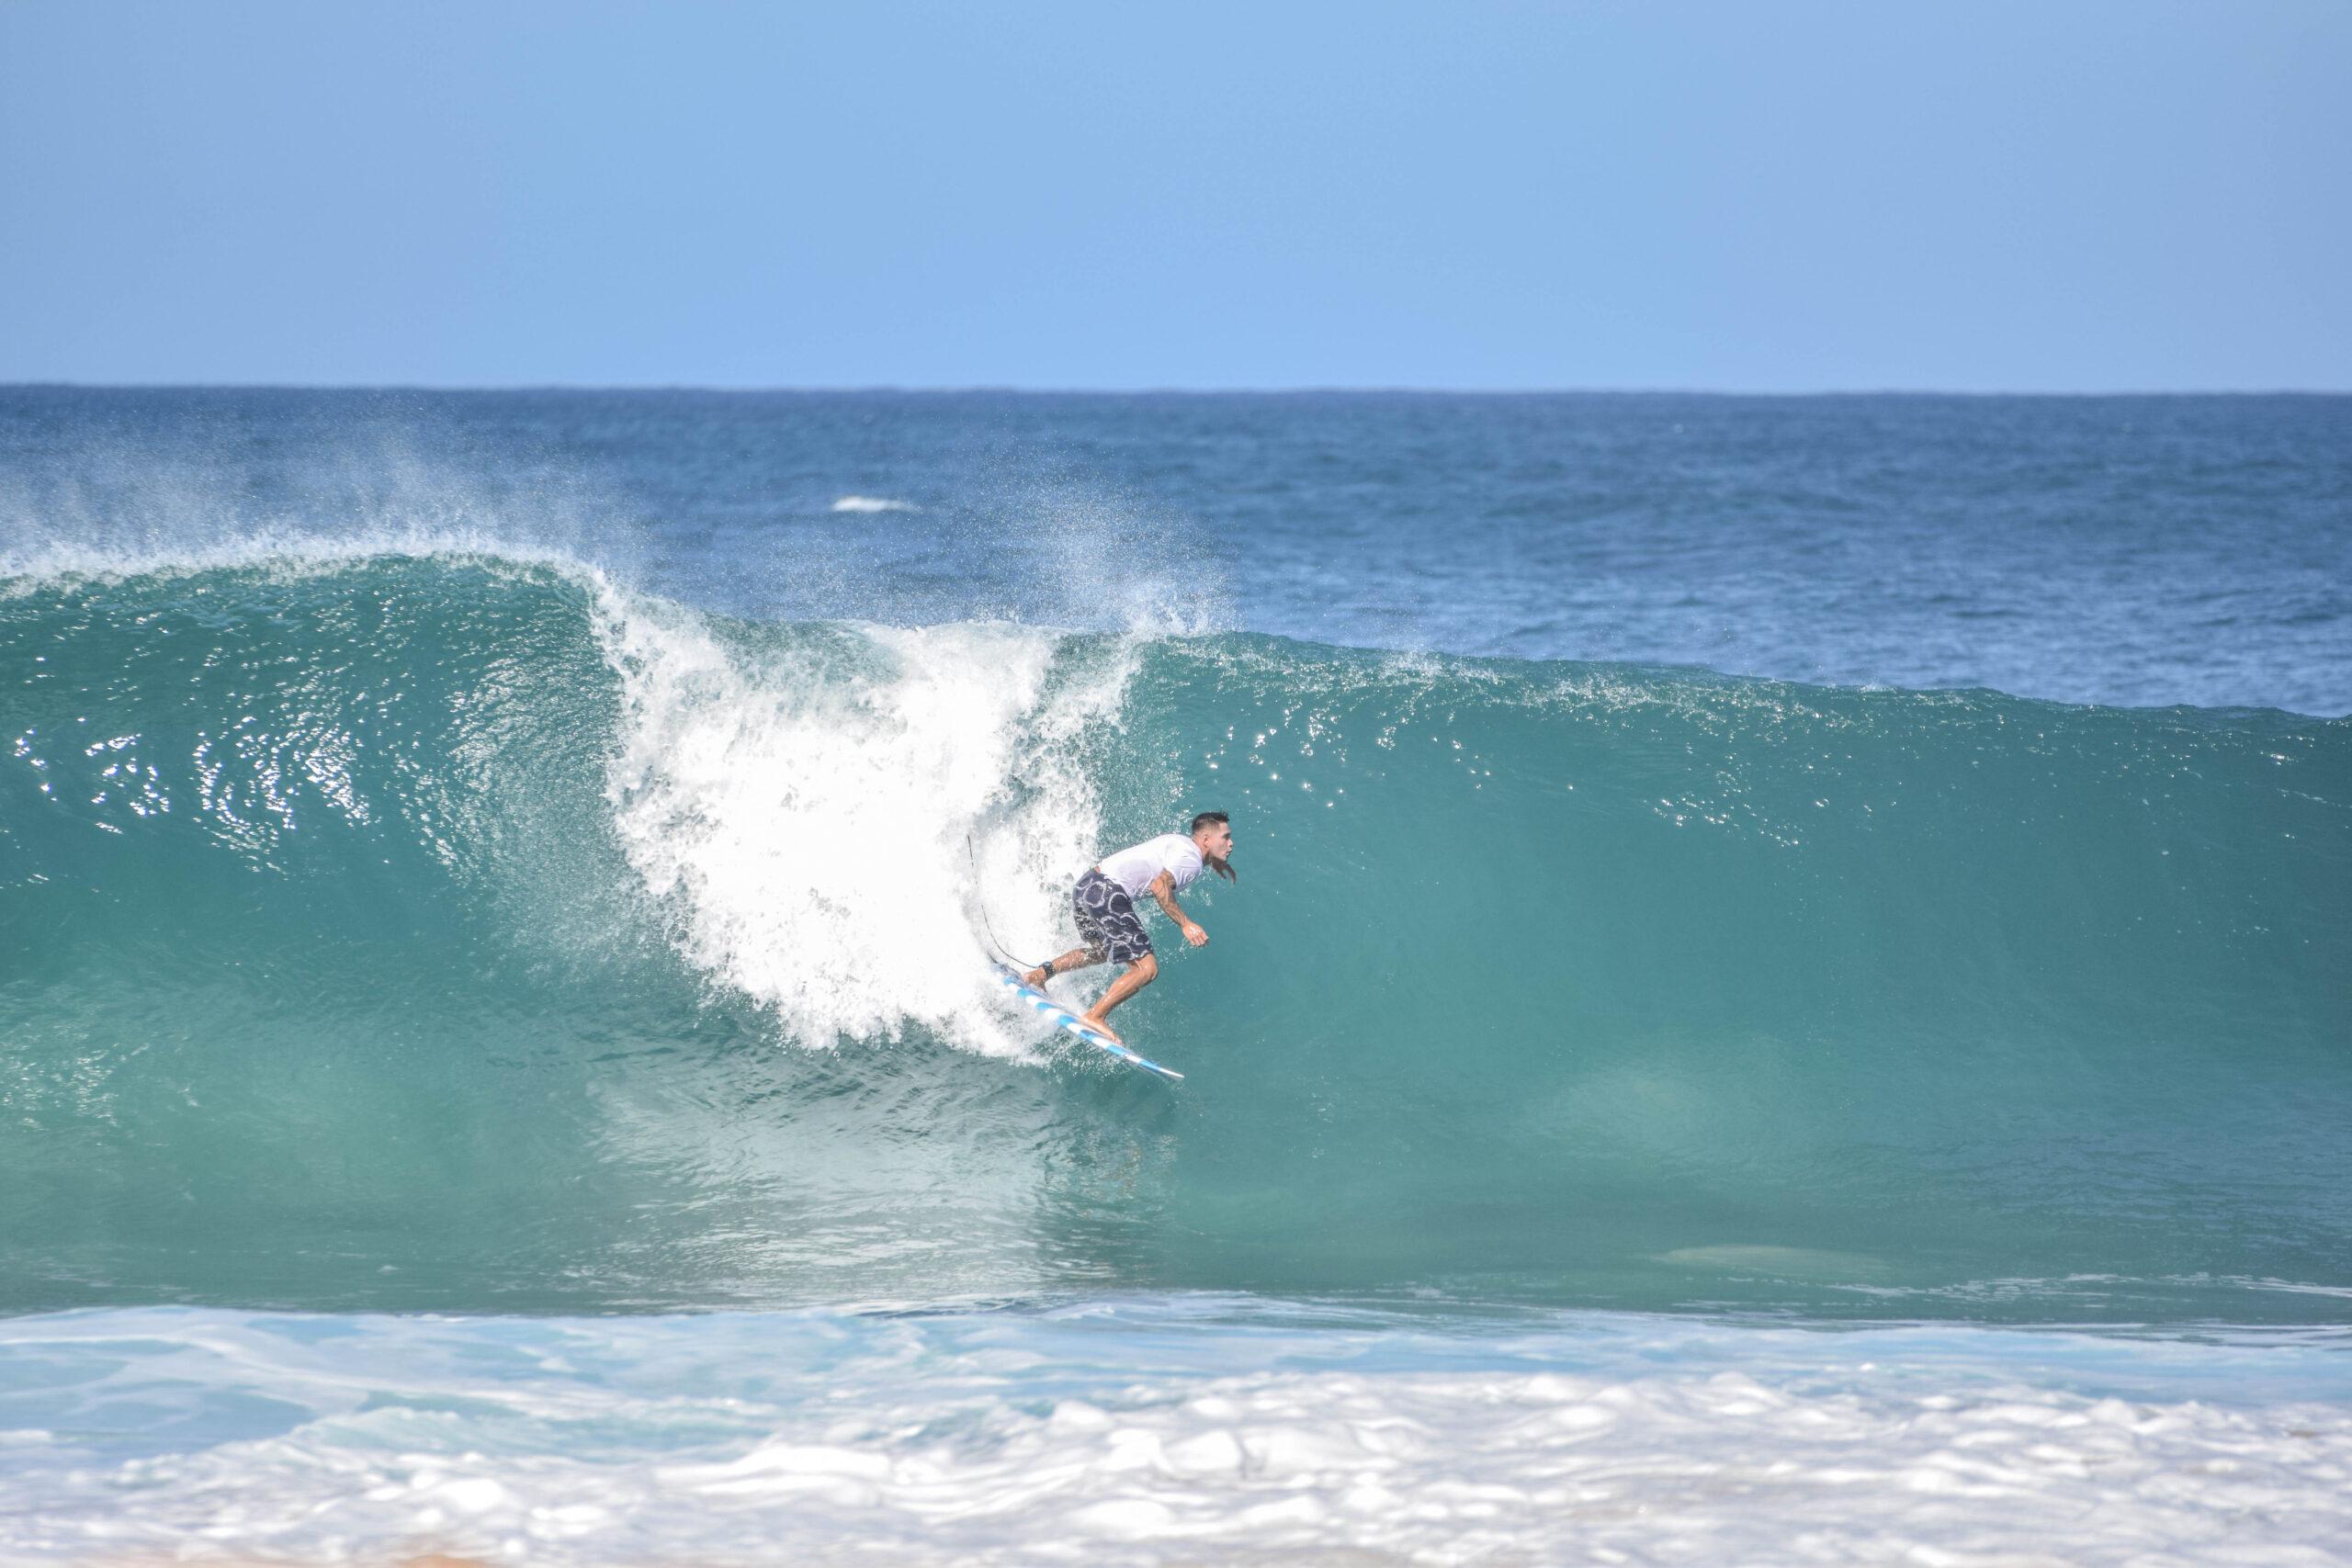 Big wave surfing - Banzai Pipeline - North Shore Oahu